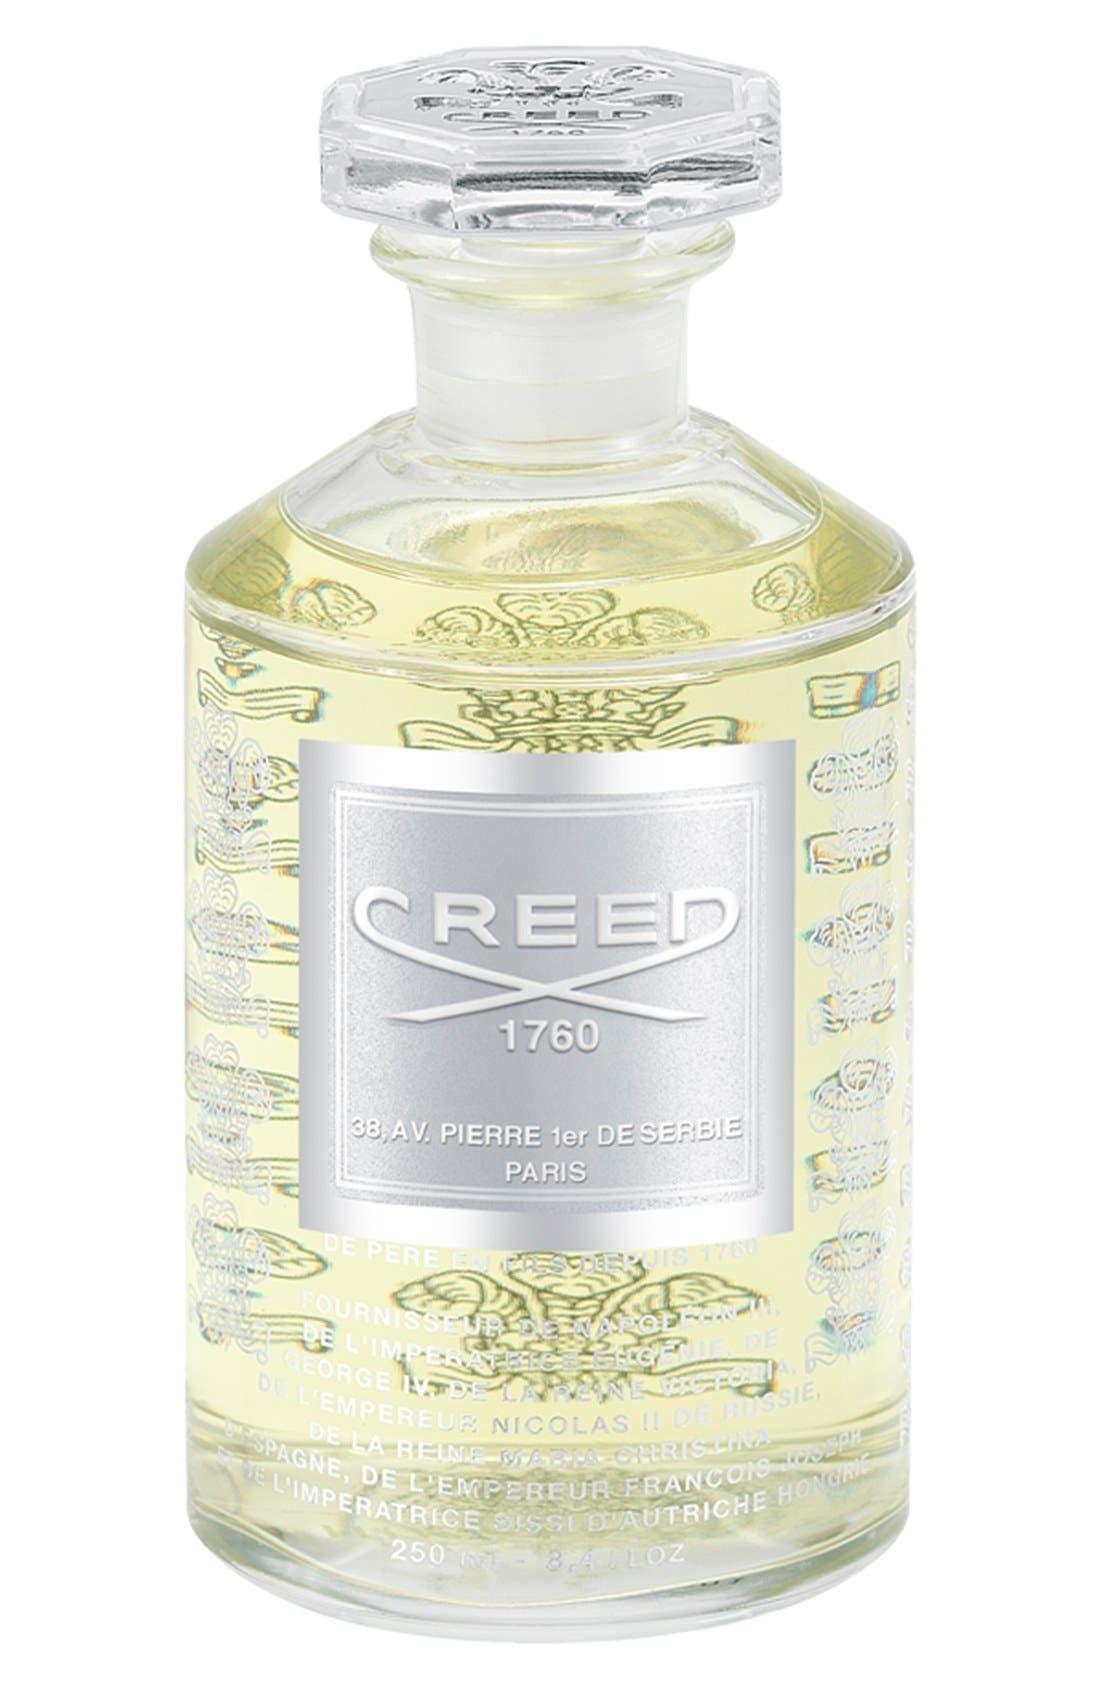 Creed 'Himalaya' Fragrance (8.4 oz.)